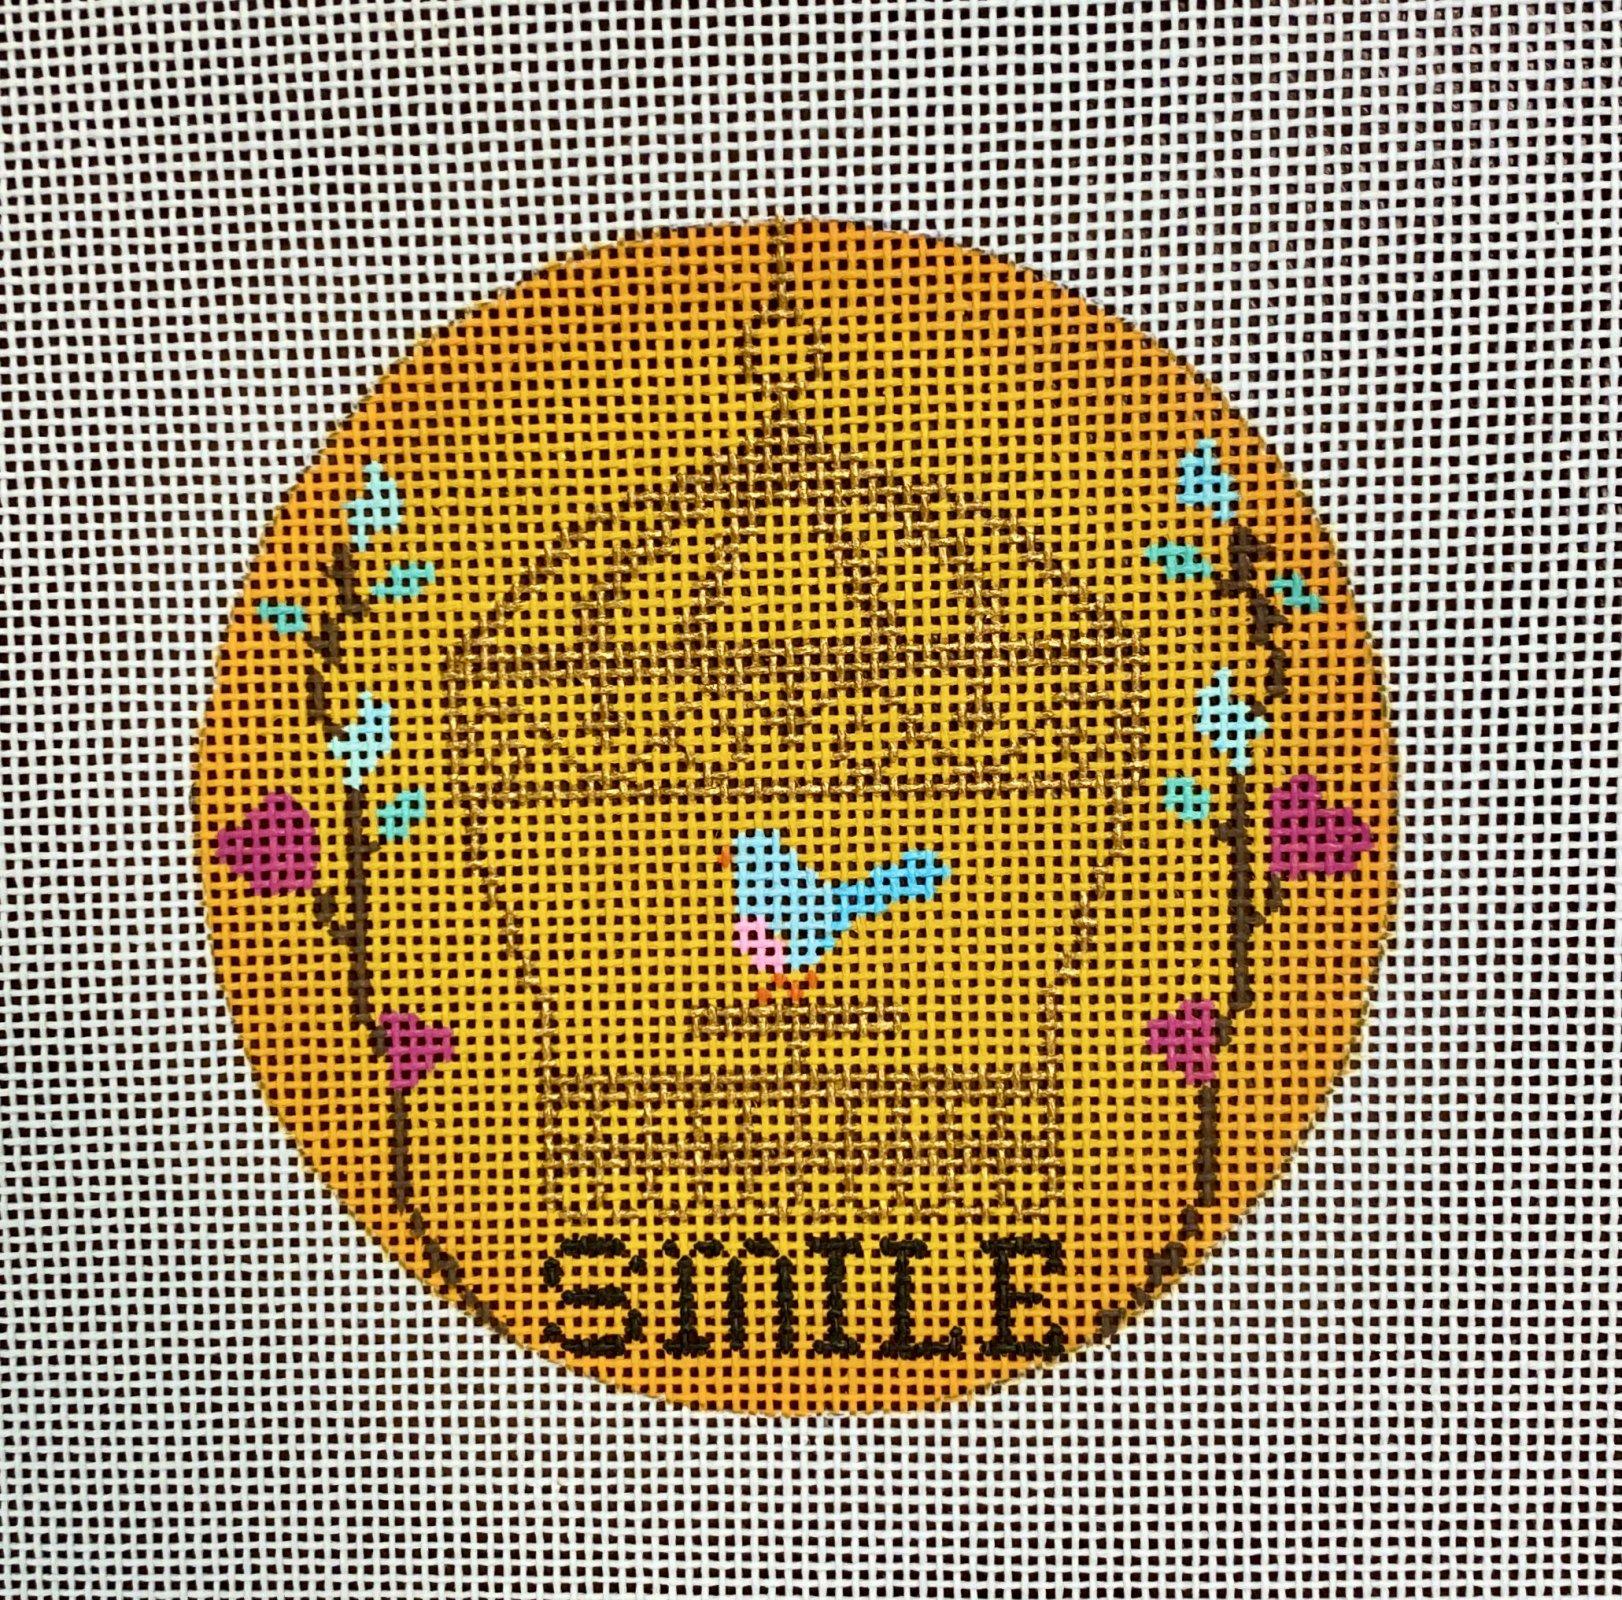 birdcage, smile